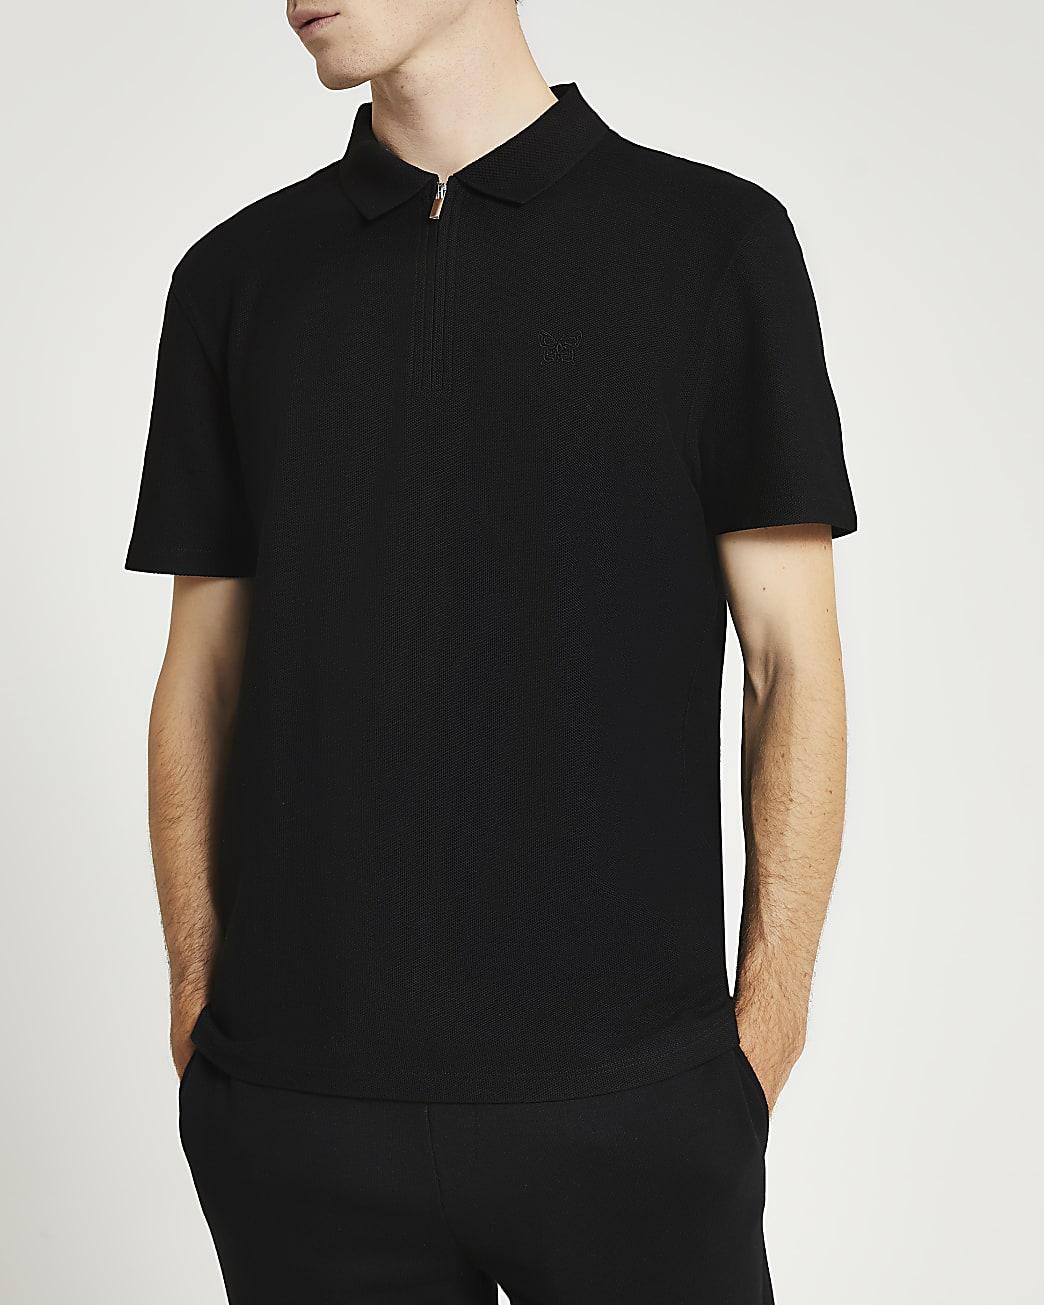 Black slim fit short sleeve polo shirt